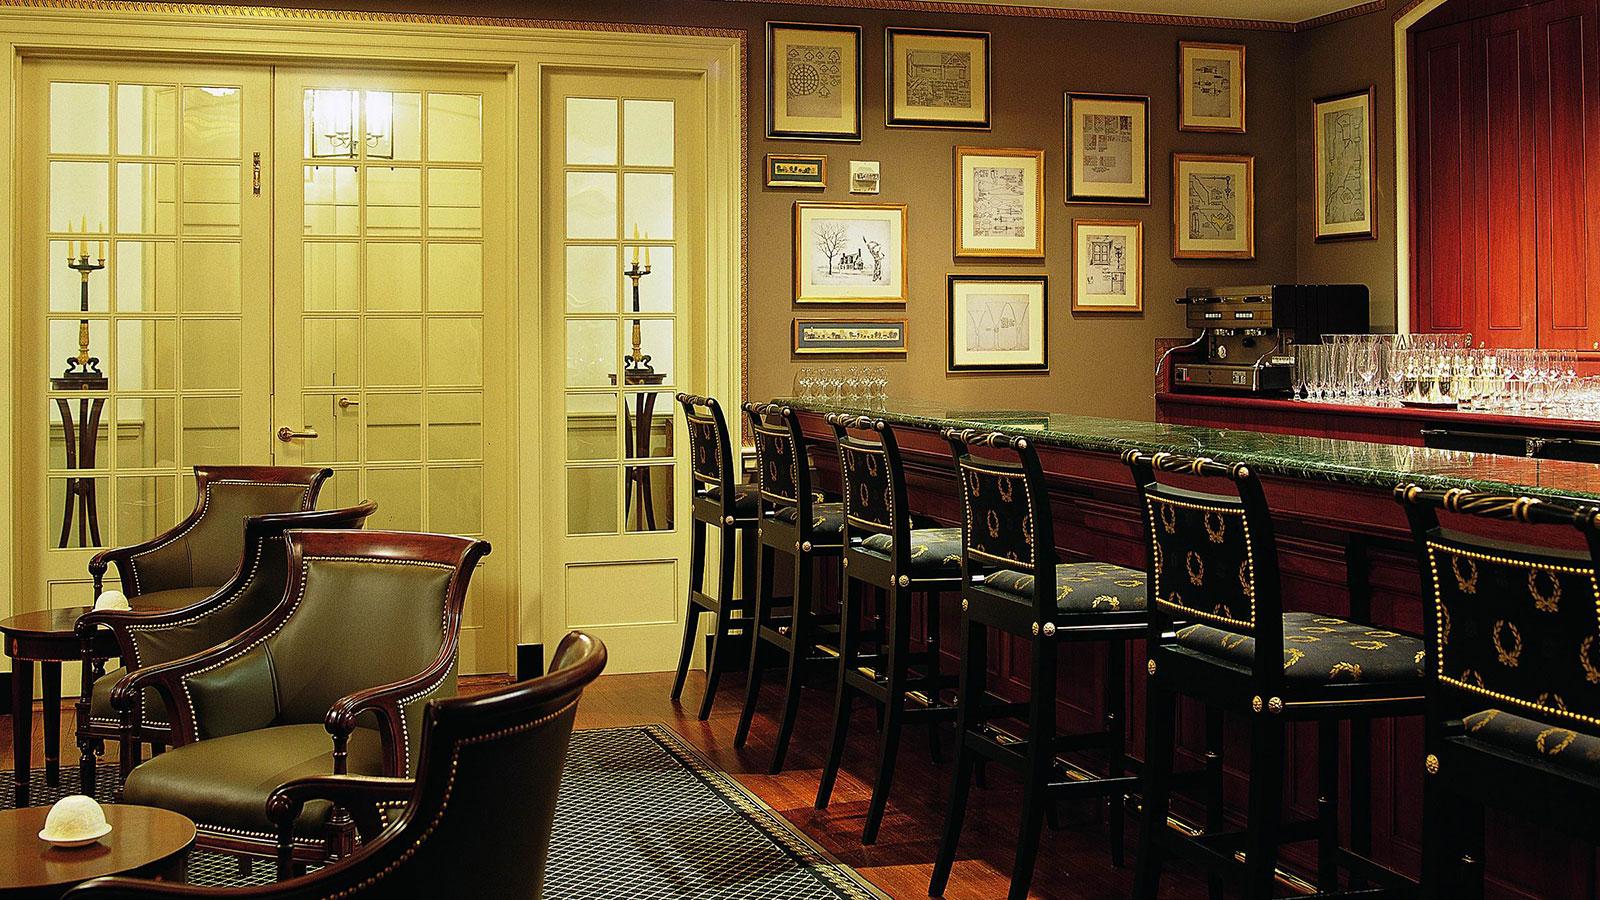 Image of King Arms tavern Williamsburg Inn, 1937, Member of Historic Hotels of America, in Williamsburg, Virginia,Taste